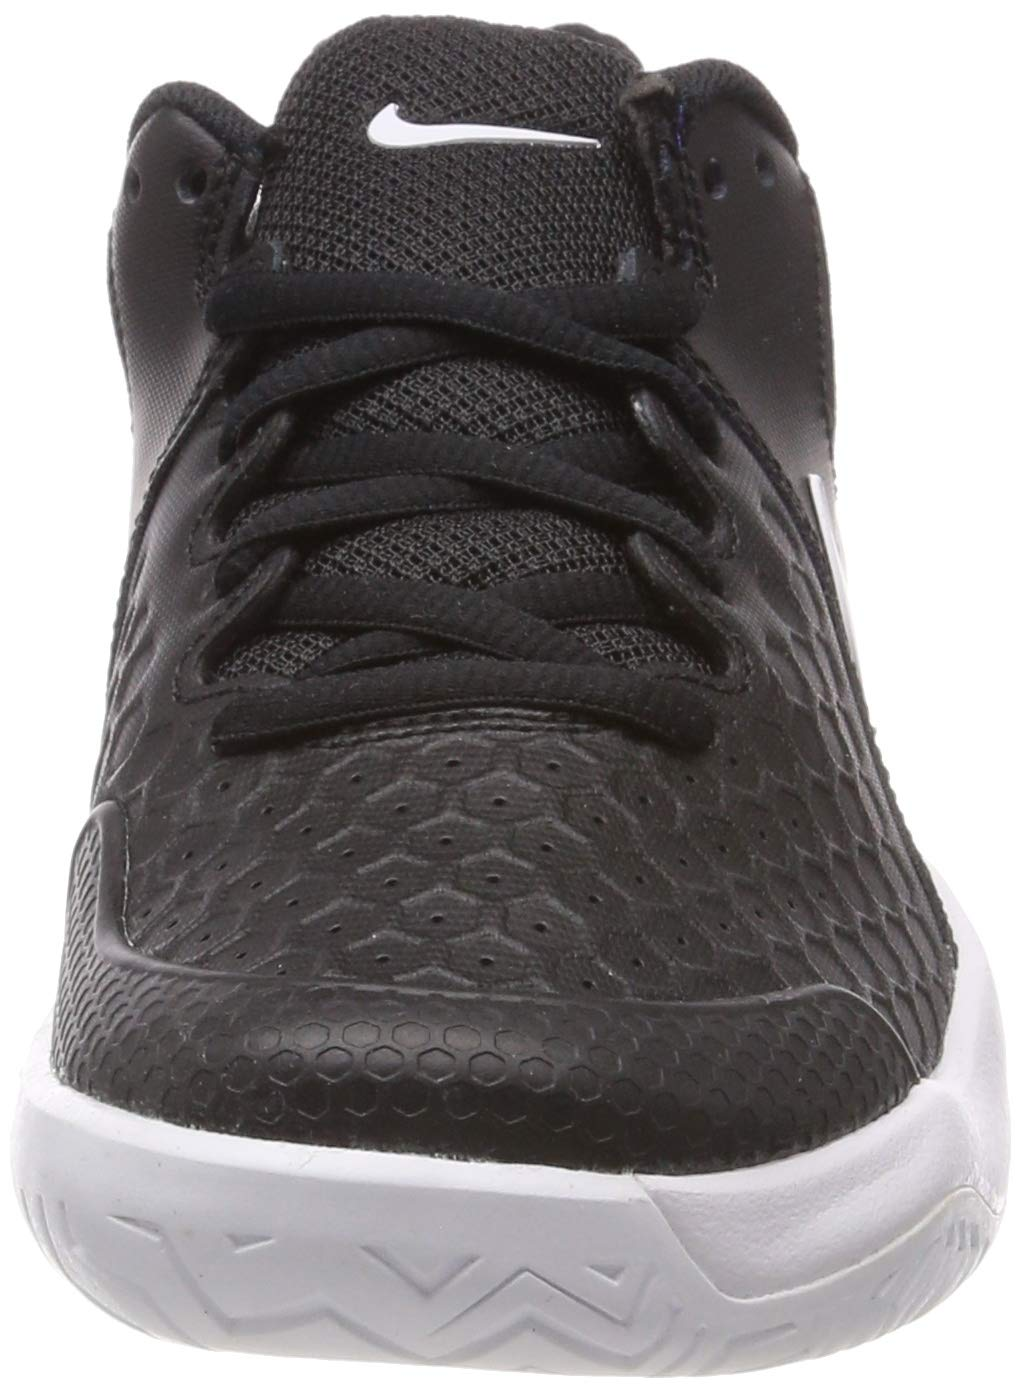 Nike Herren Air Zoom Resistance Fitnessschuhe B0059UZ916 B0059UZ916 B0059UZ916 Tennisschuhe Hat einen langen Ruf 25cf49